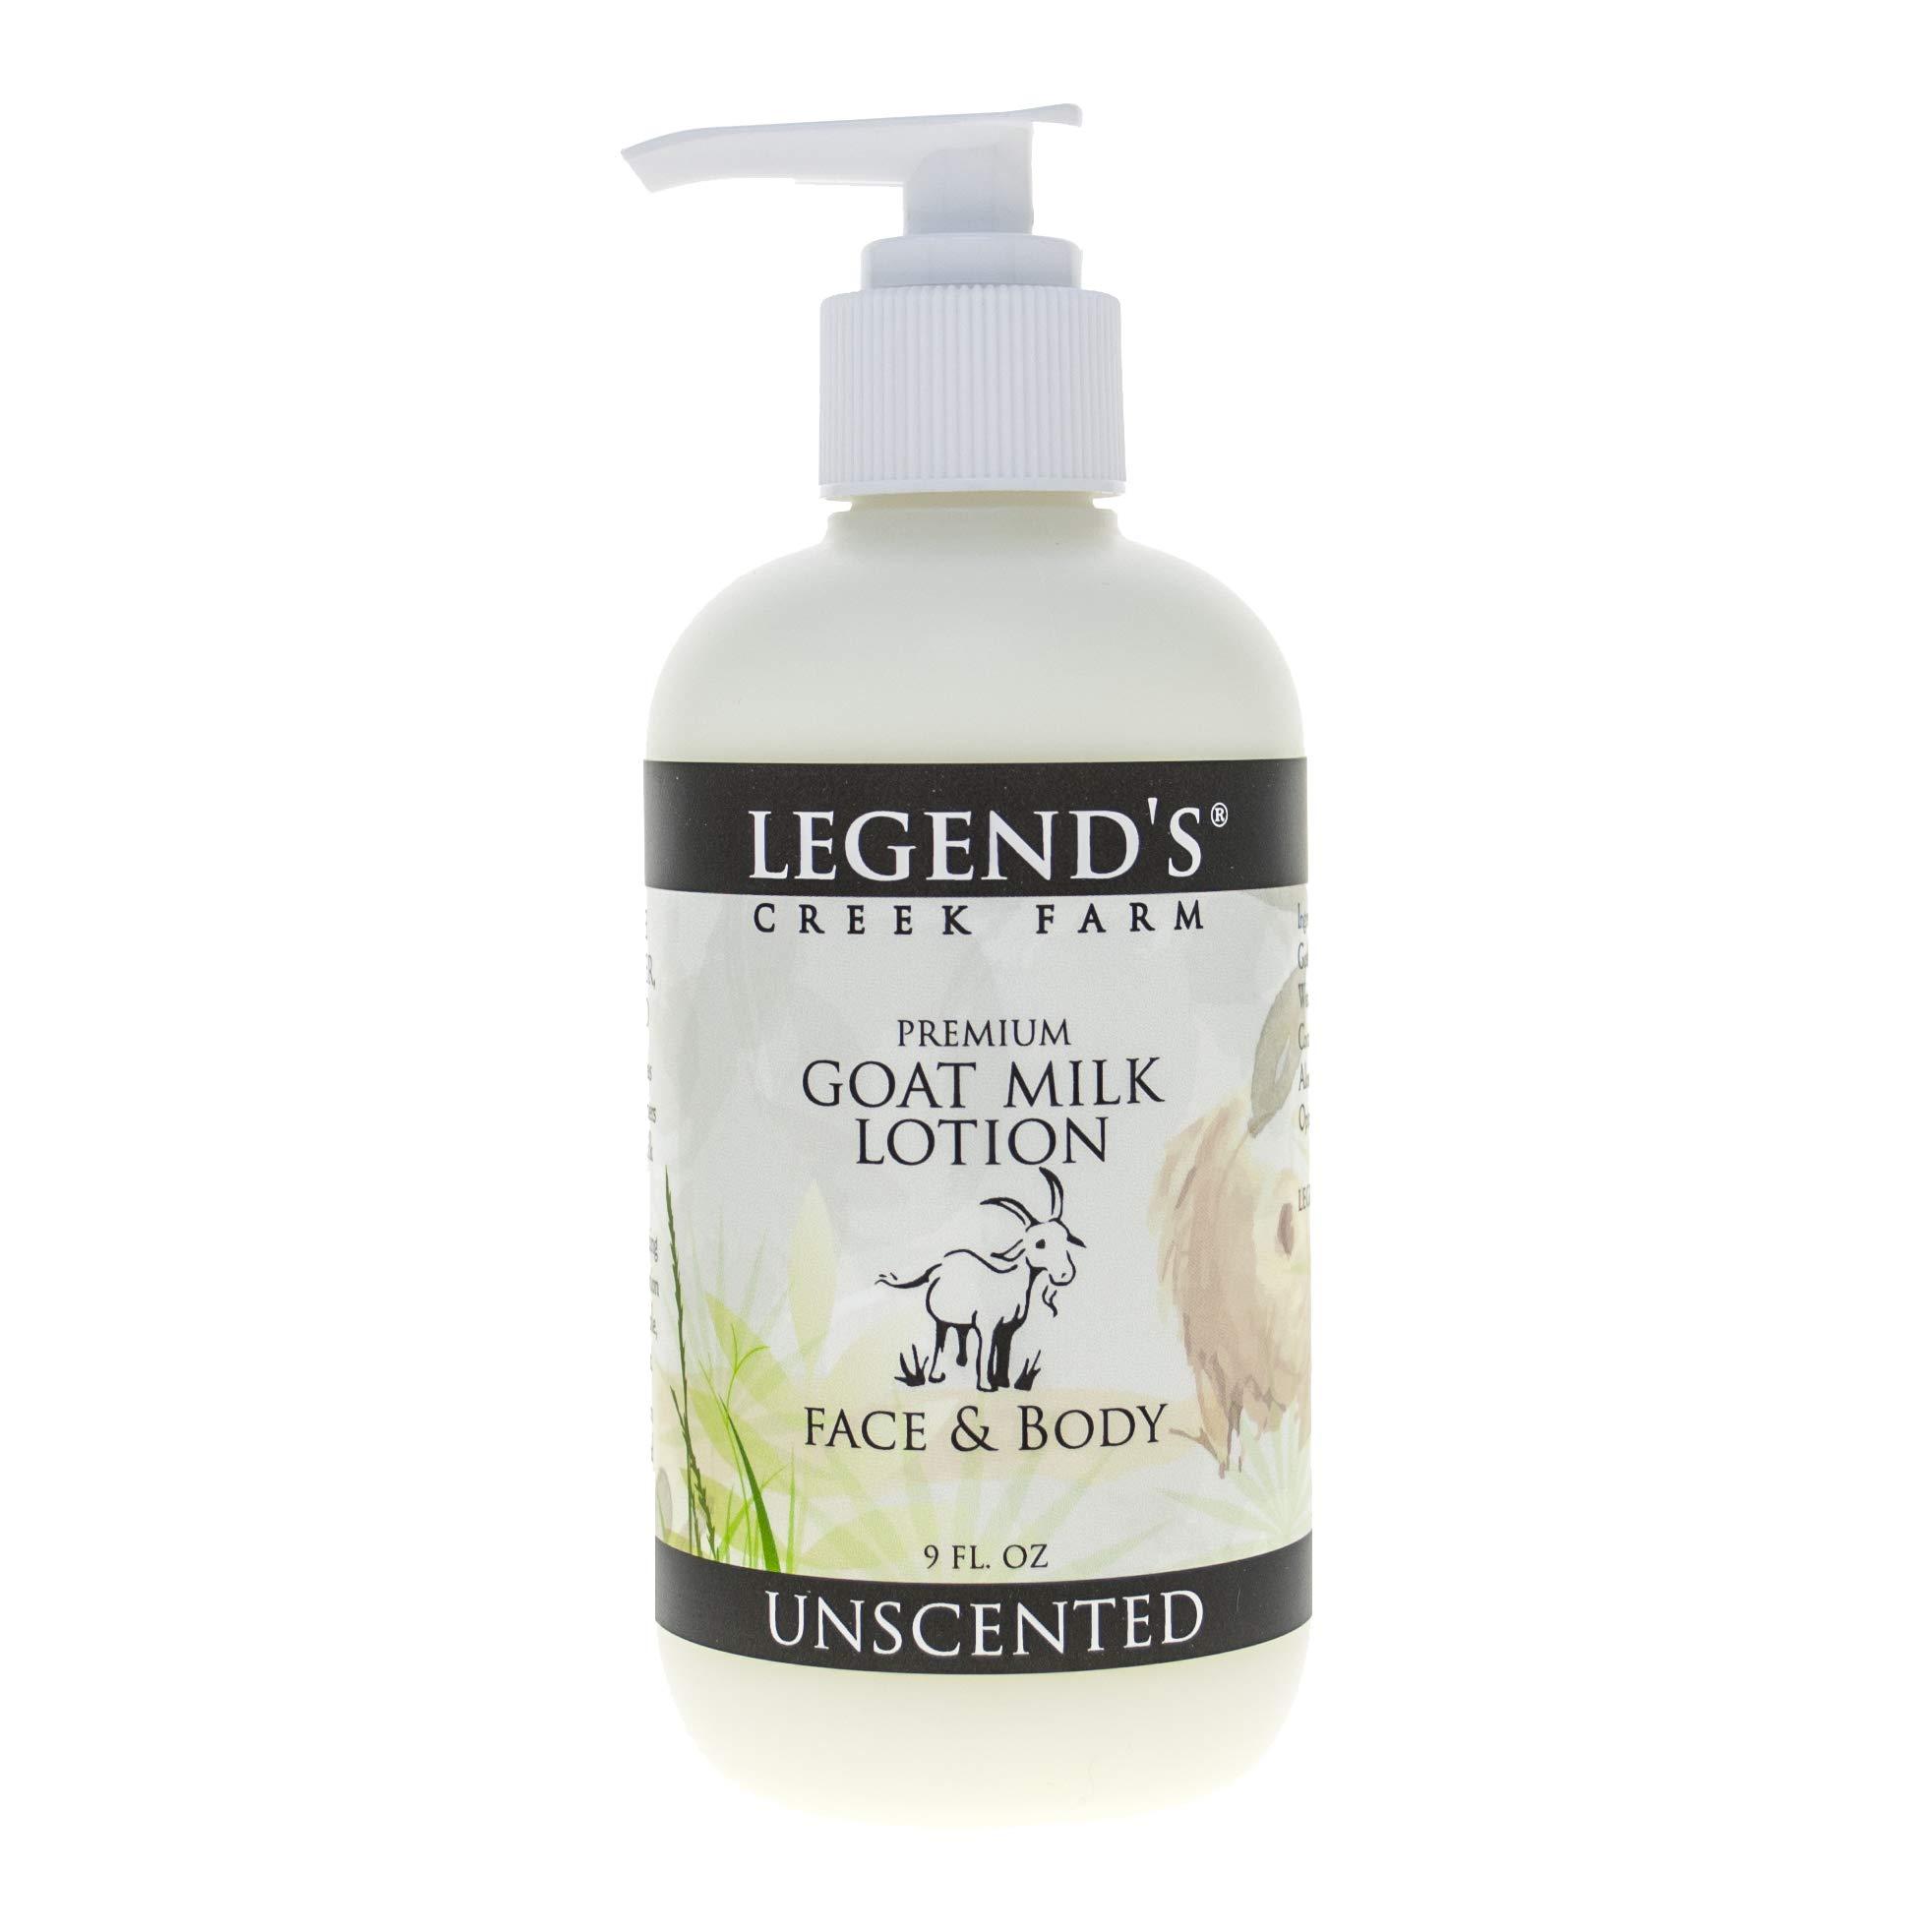 e2cdc283 Amazon.com : Unscented Goat Milk Lotion - 9 Oz Bottle - Paraben Free,  Gentle & Natural For Sensitive Skin : Beauty